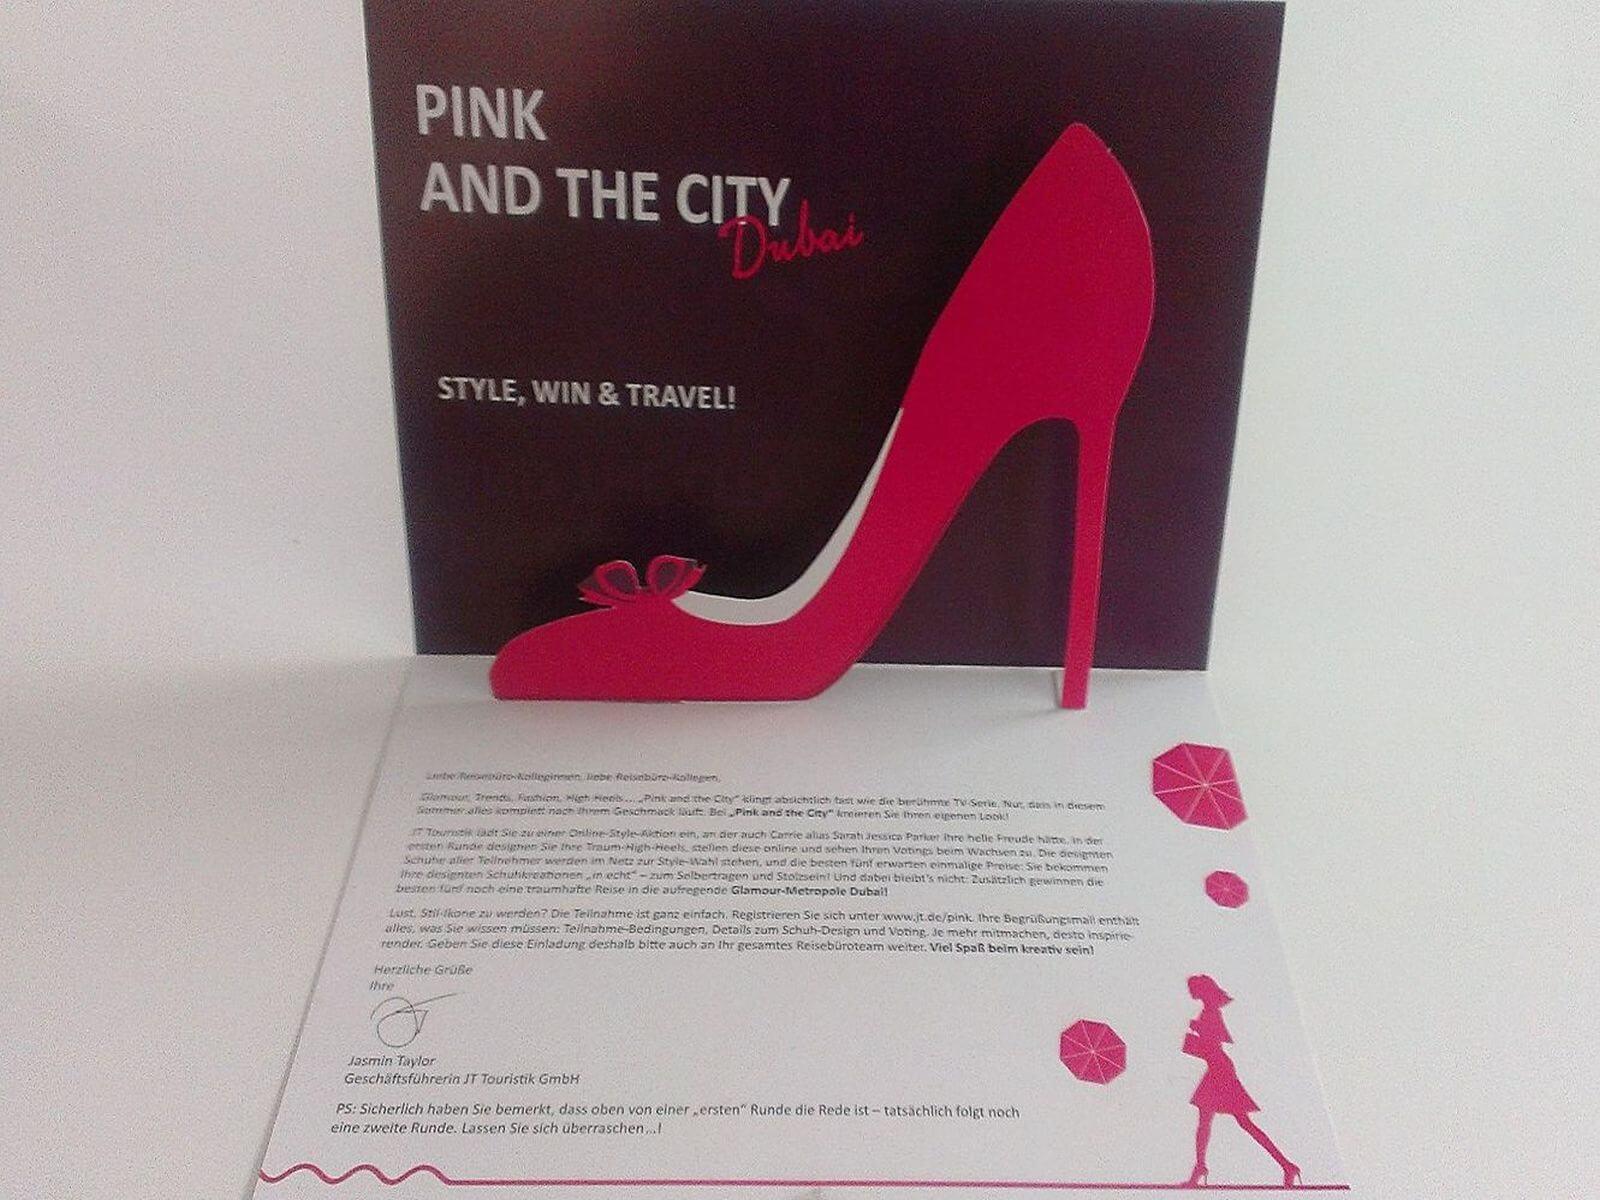 Pink and the City Dubai - JT Touristik